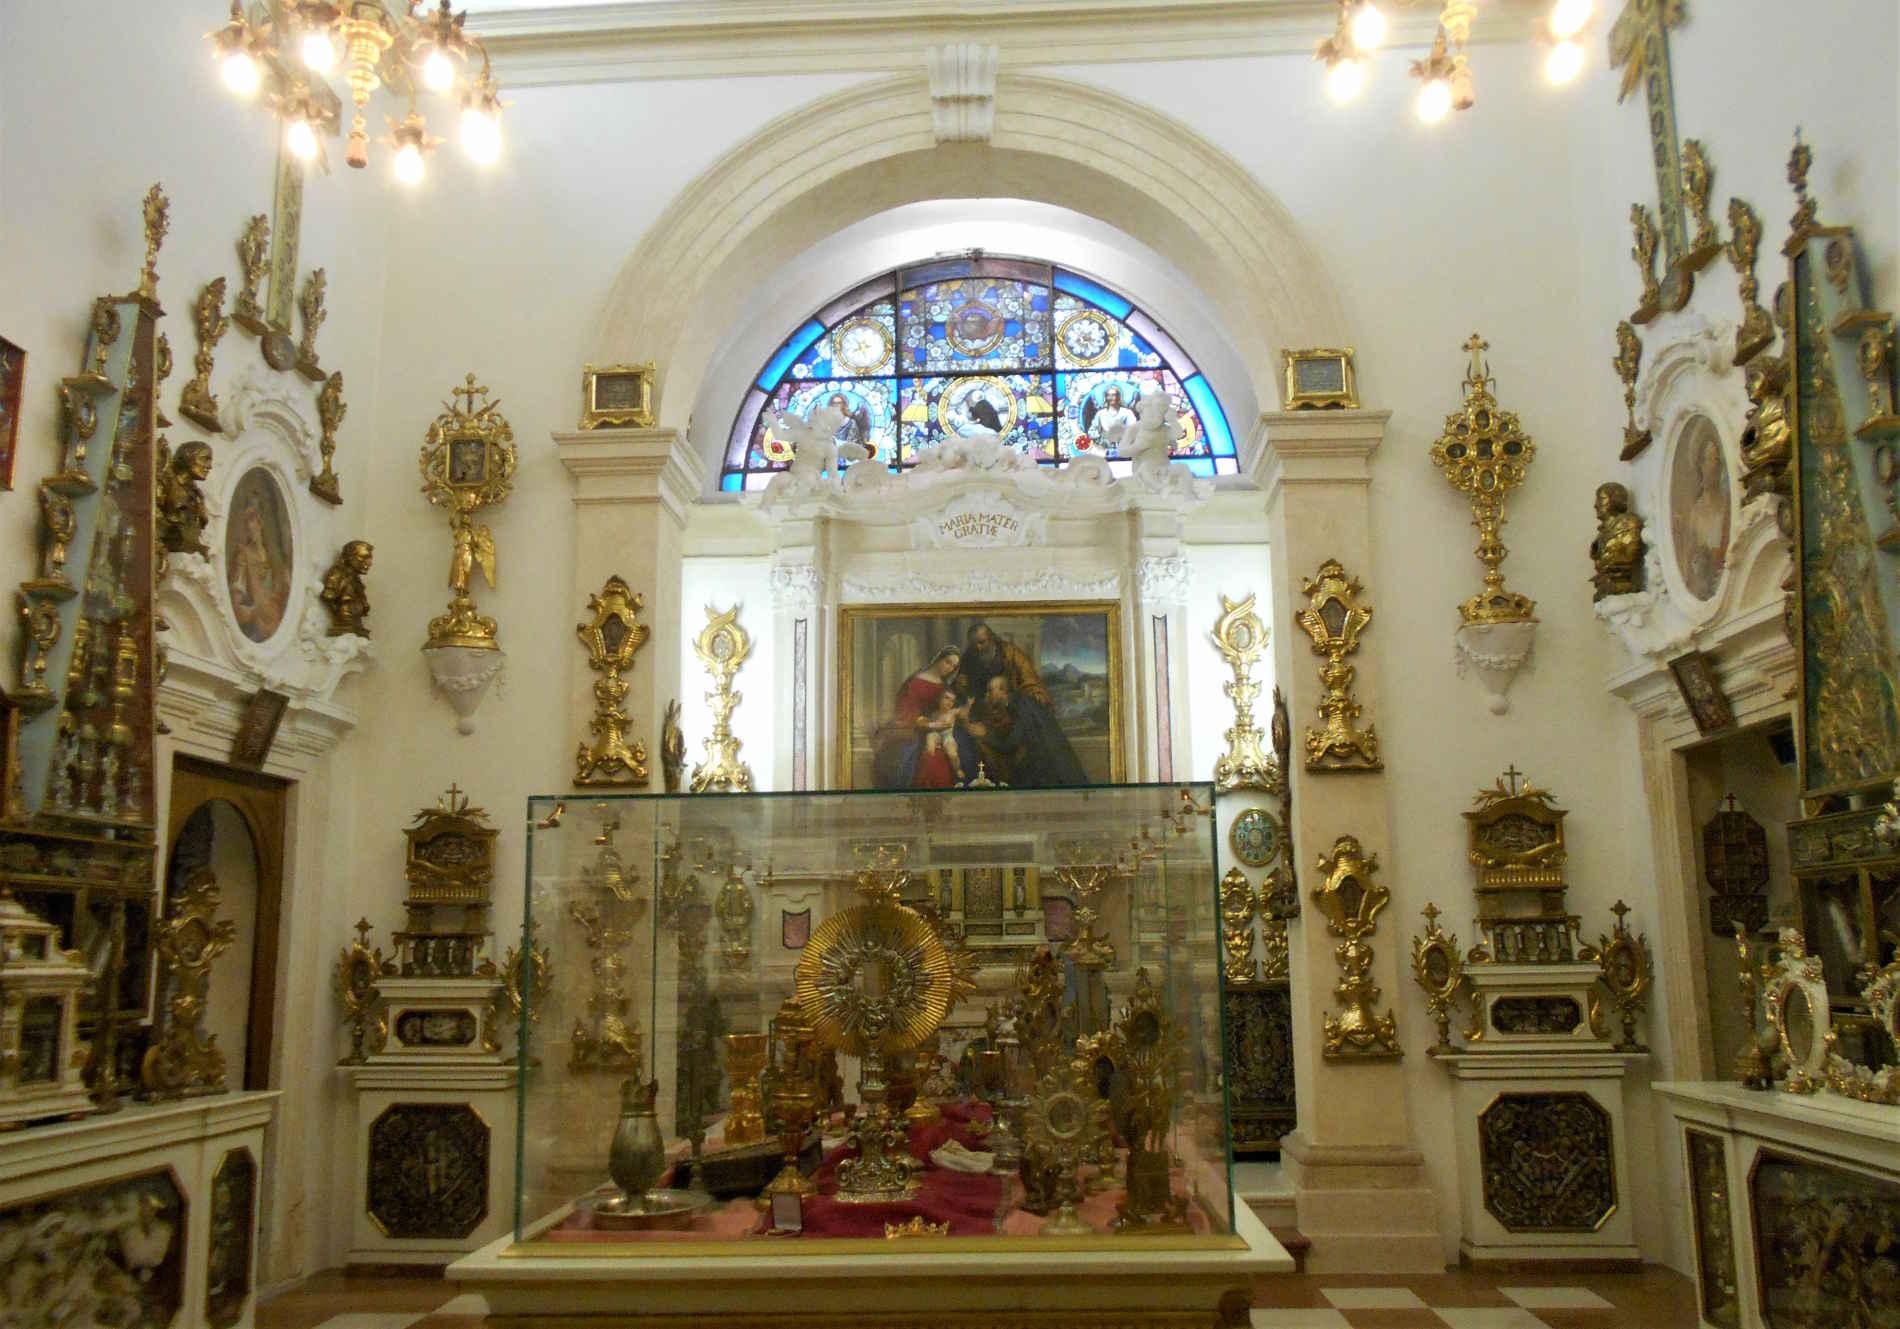 Reliquiari a go go nella Chiesa di Santa Maria del Paradiso a Verona itinerari di Verona Minor Hierusalem